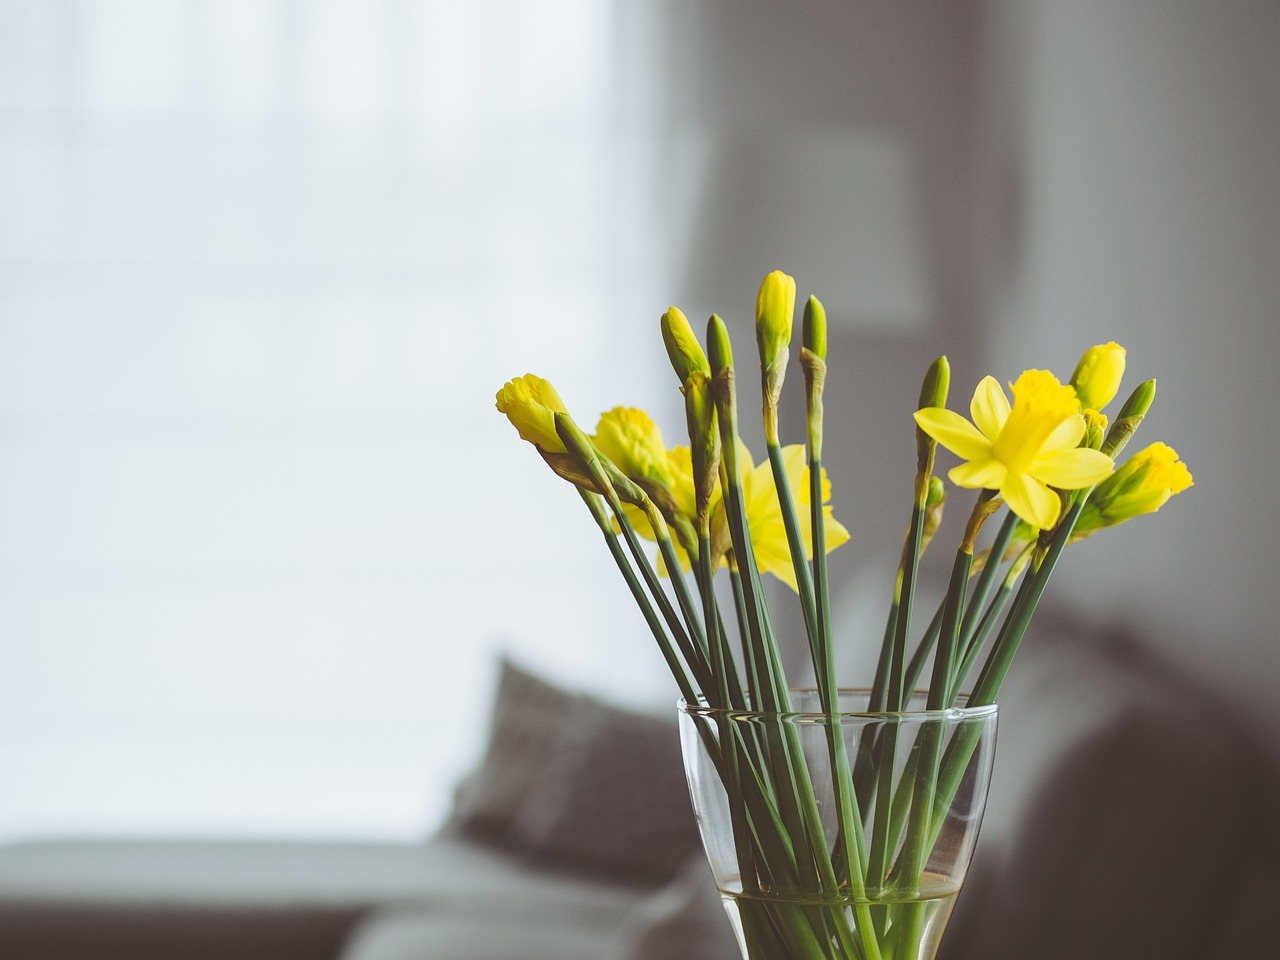 flowers-819361_1280